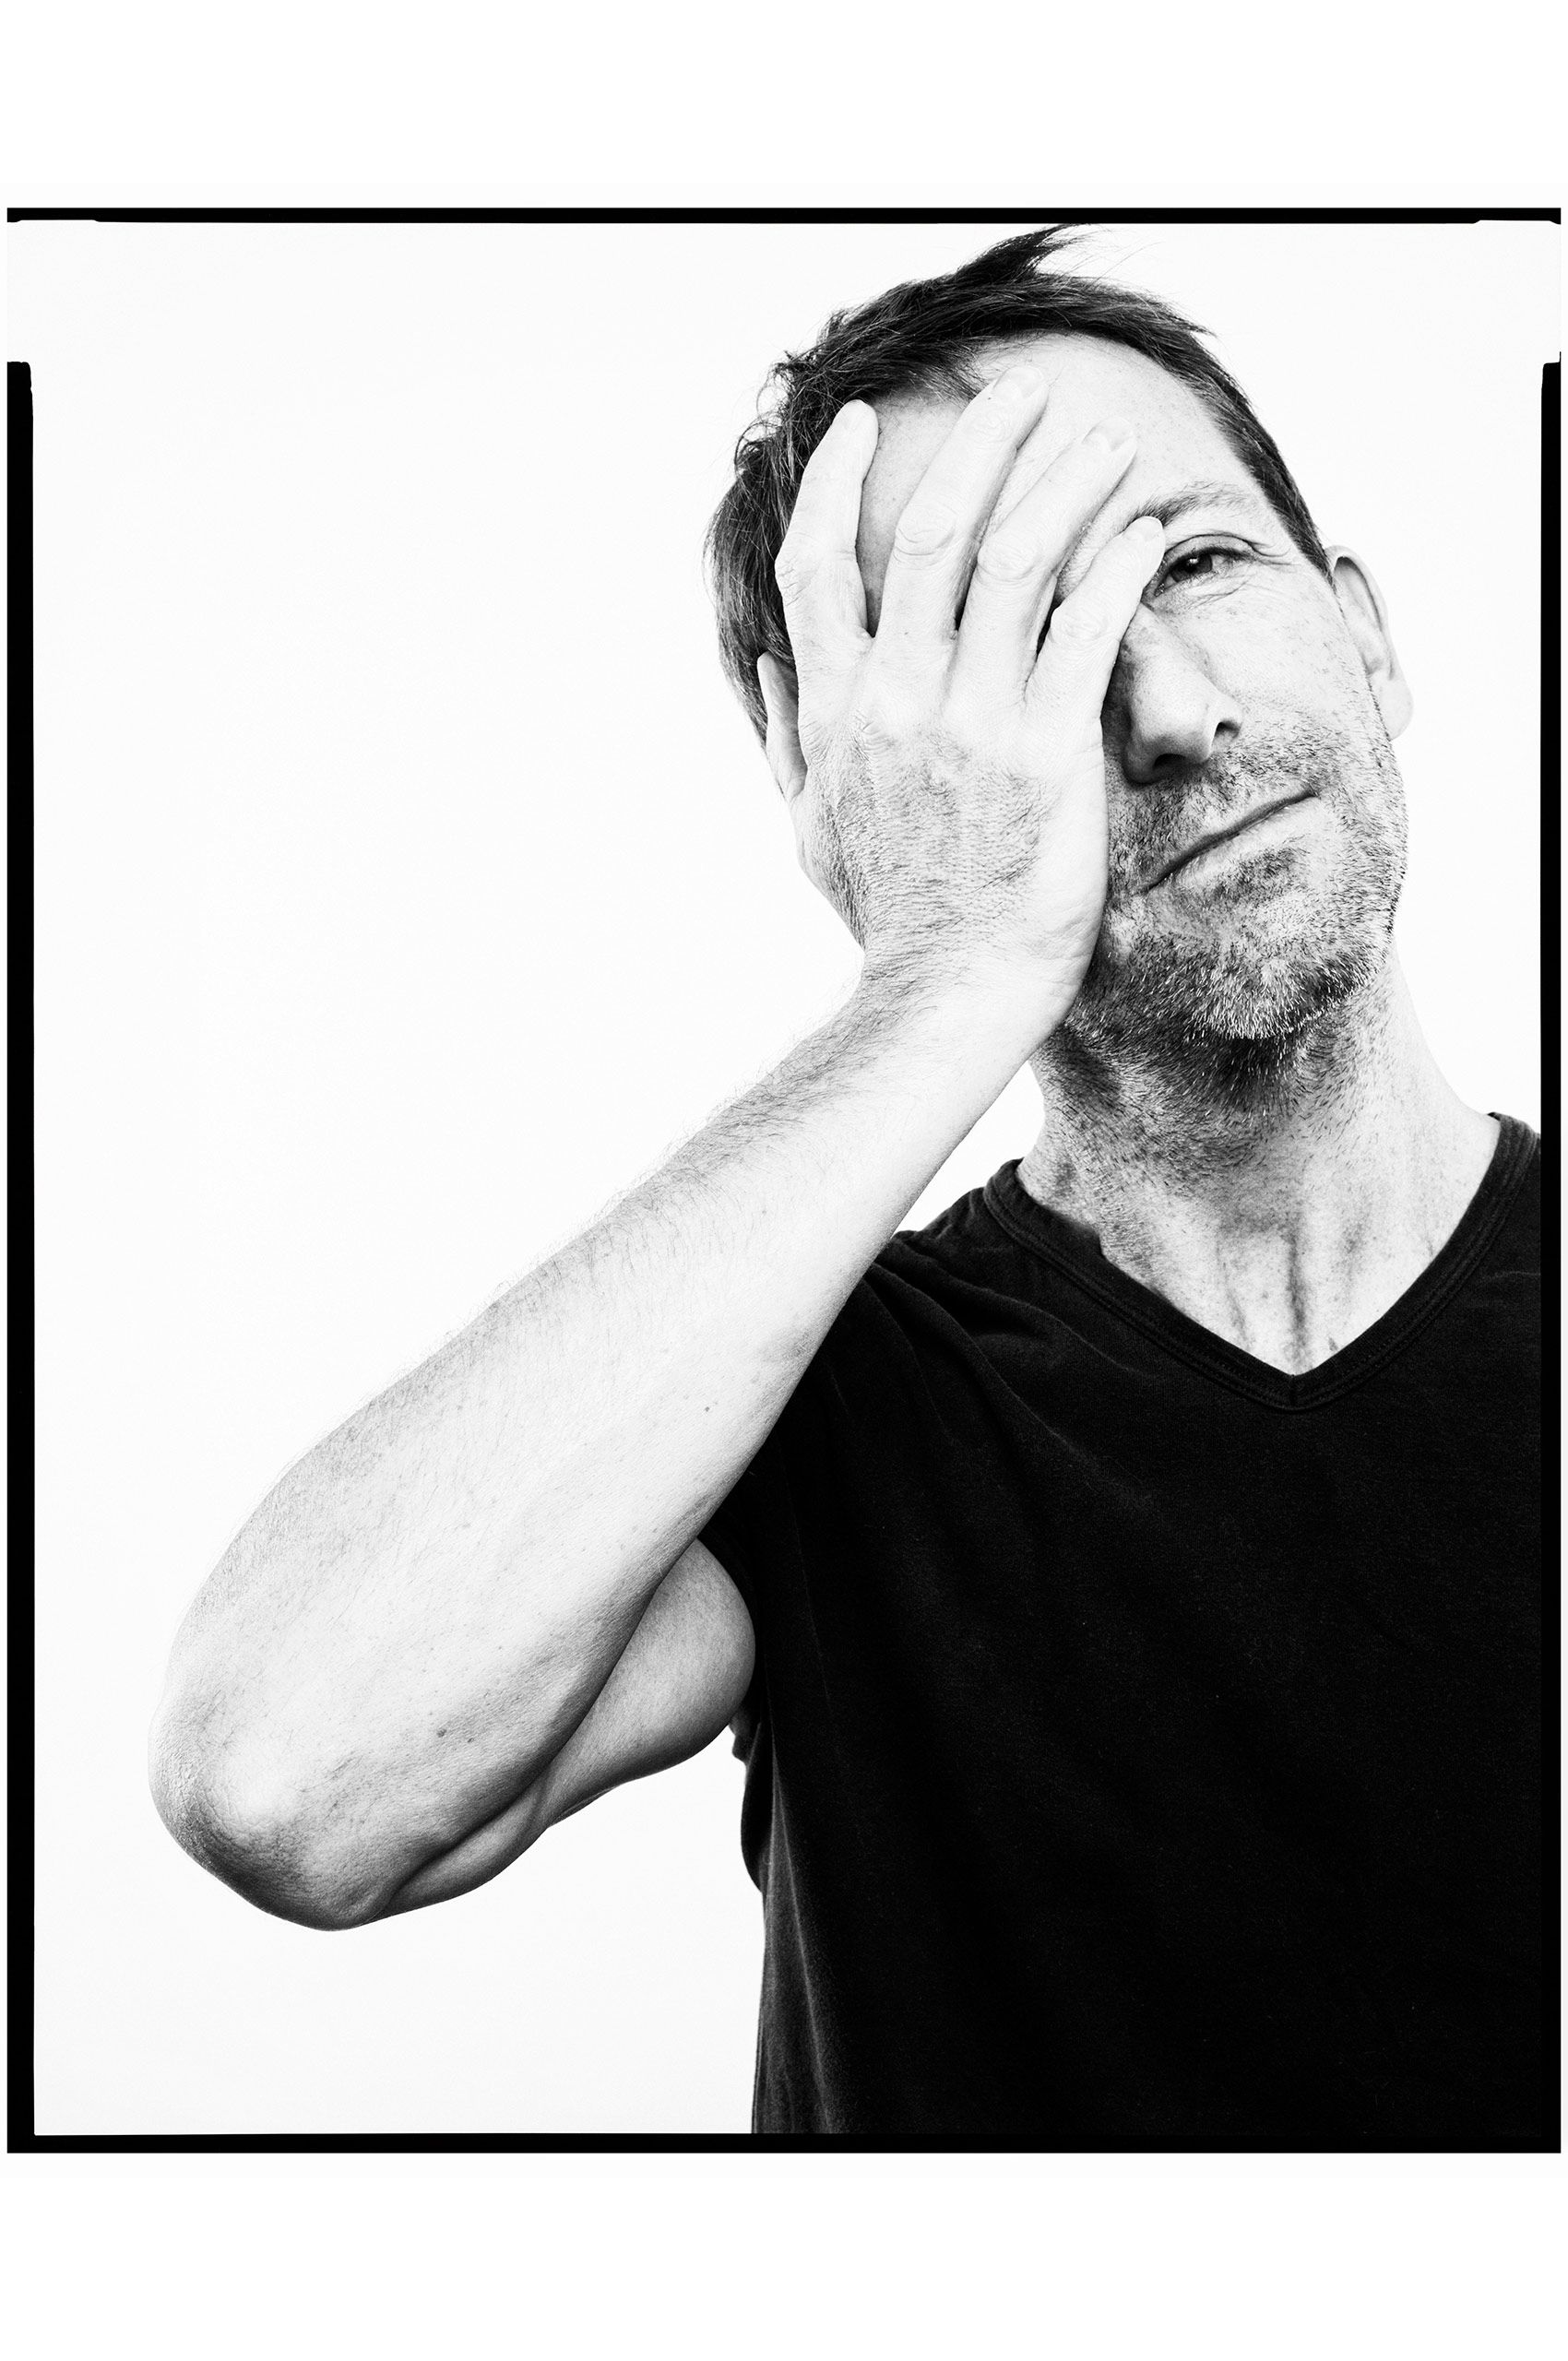 MaxwellRyan-Portrait-HenrikOlundPhotography.jpg